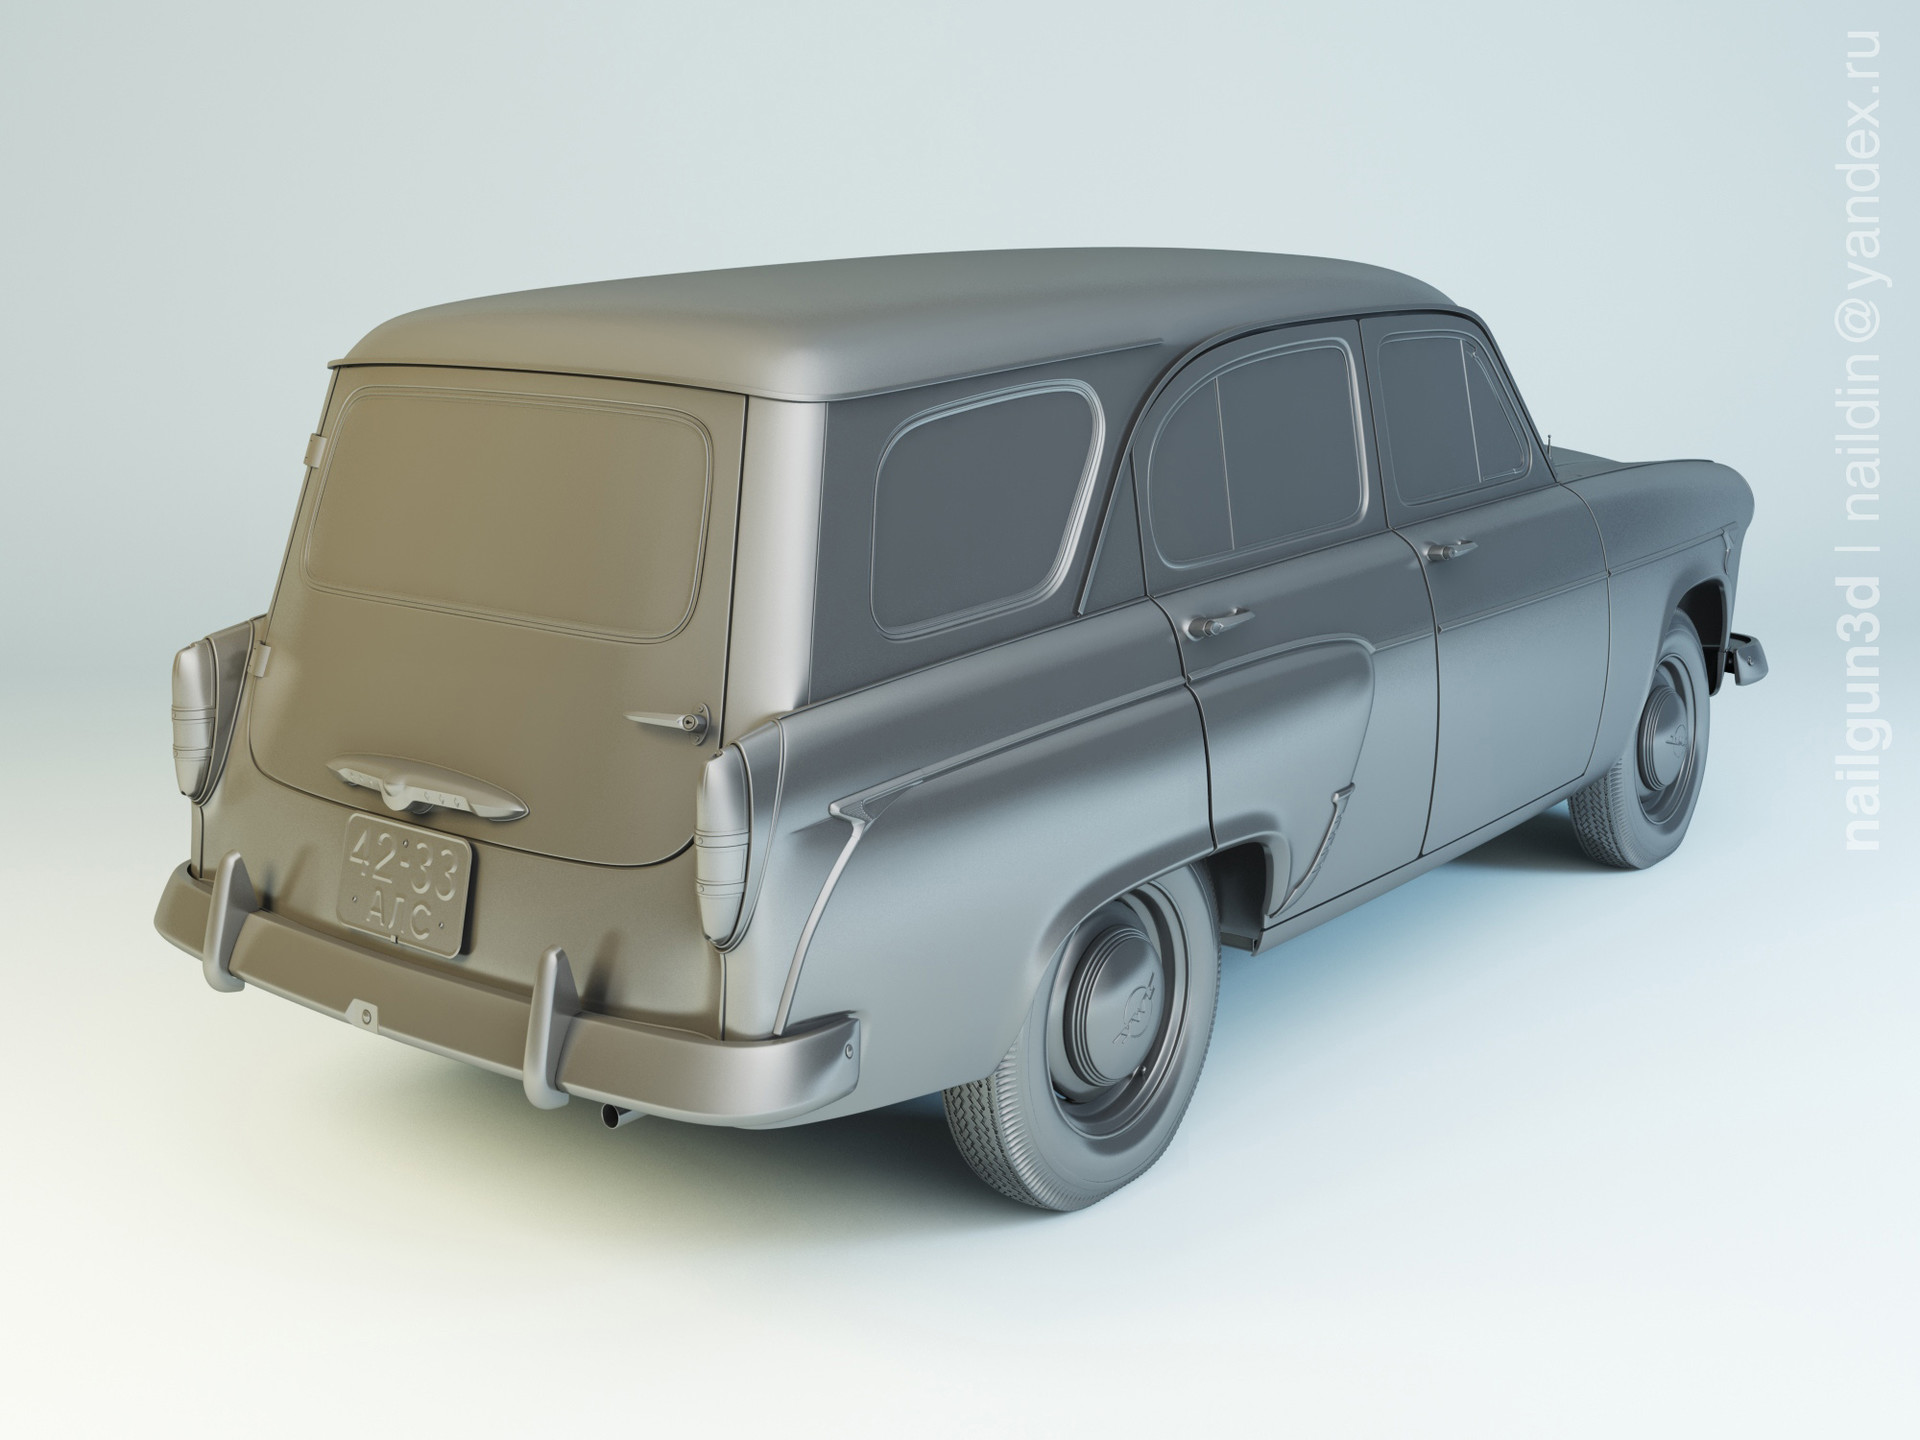 Nail khusnutdinov als 204 000 moskvich 423 1960 modelling 1